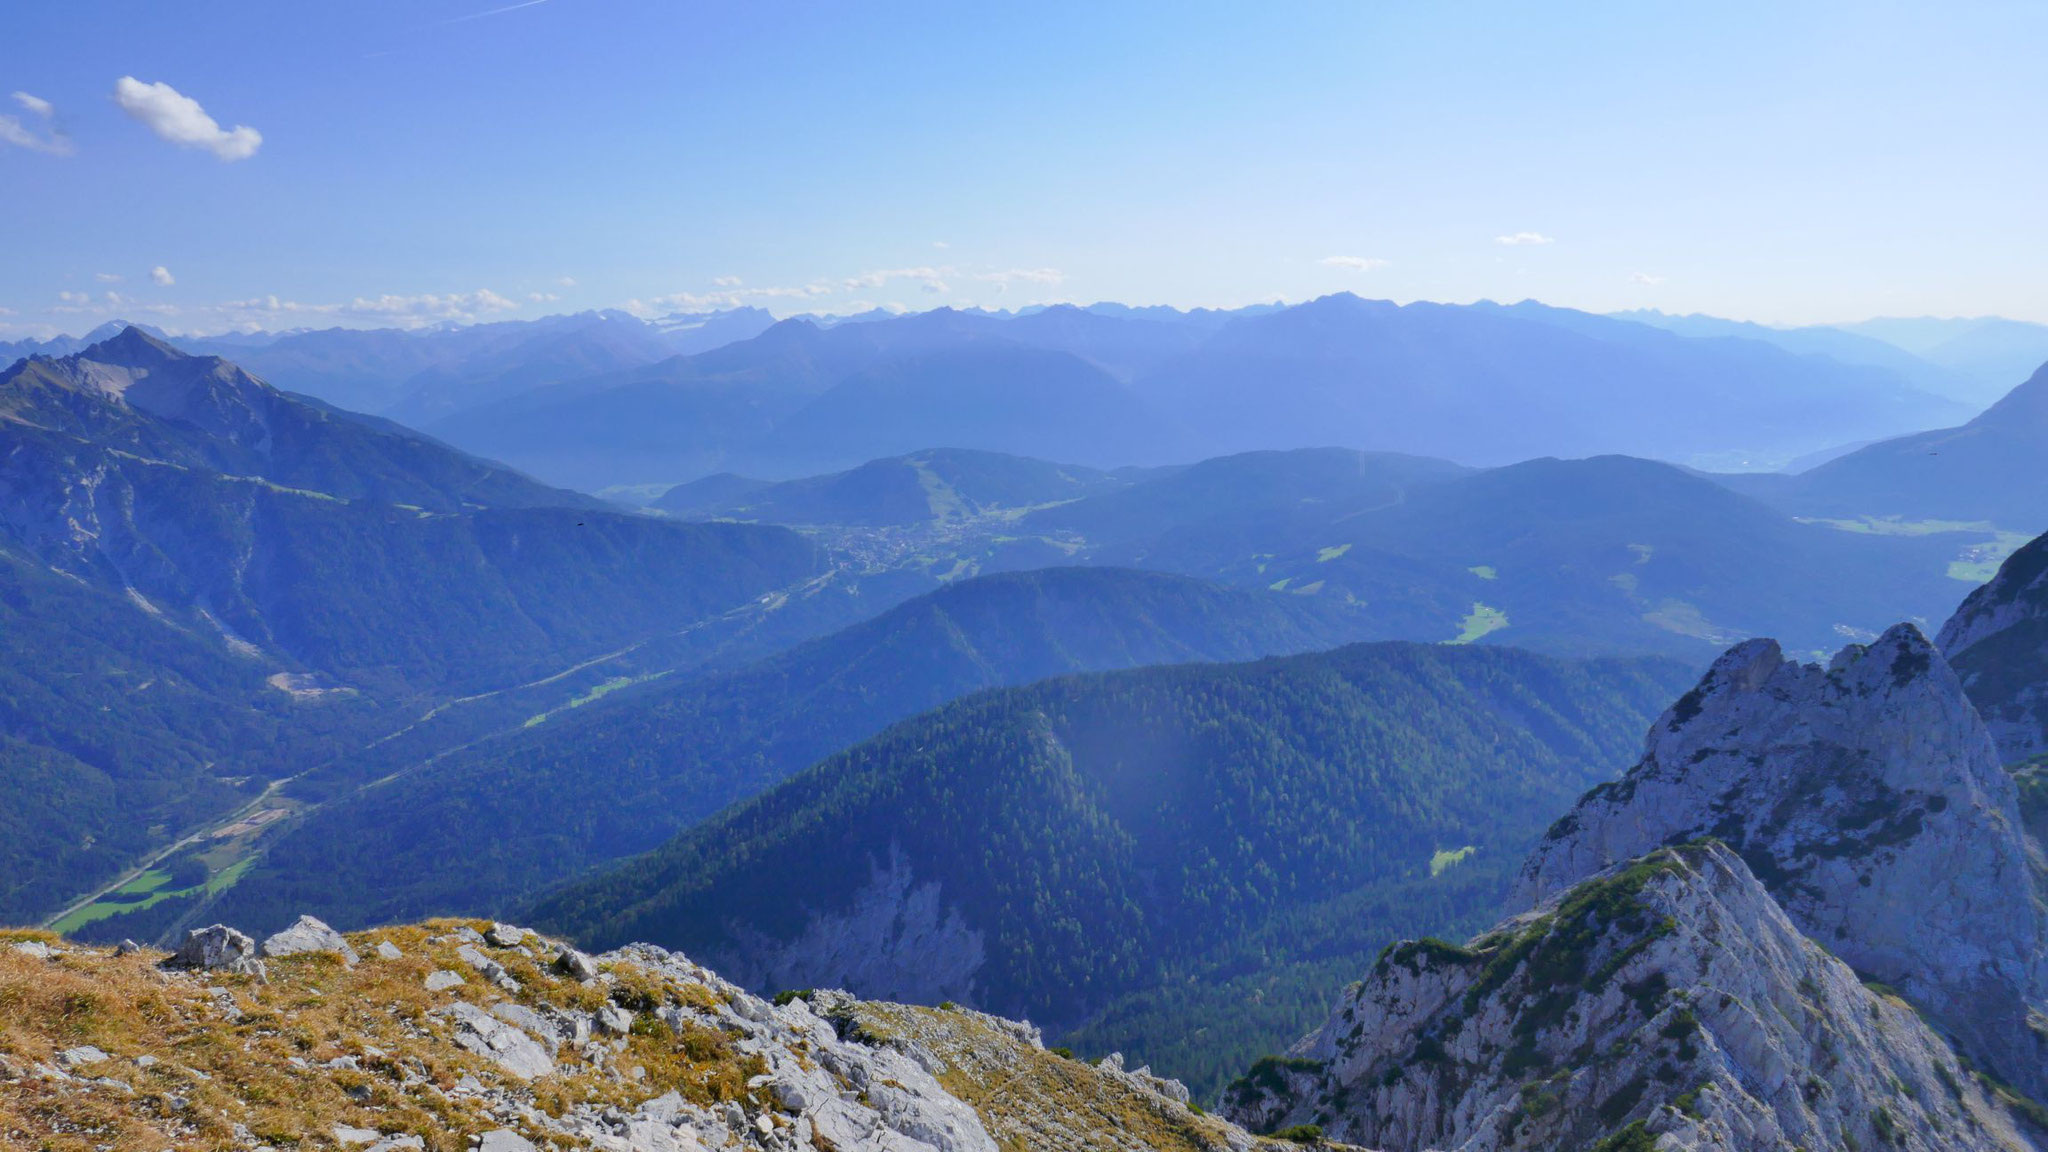 Seefelder Plateau, dahinter Stubaier Alpen